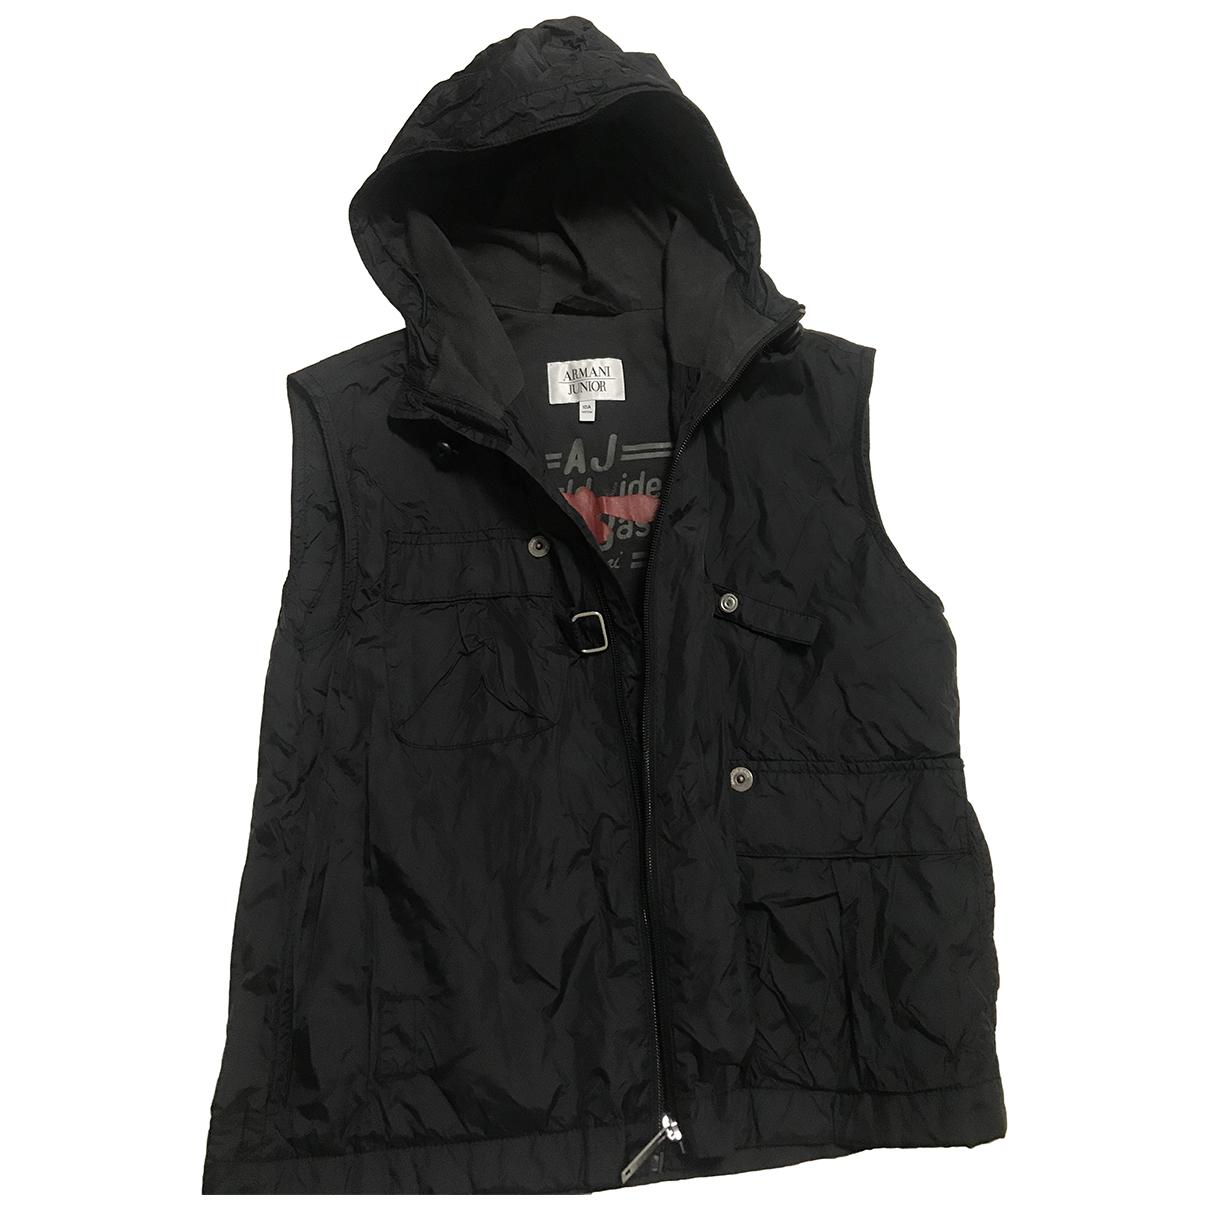 Armani Jeans \N Jacke, Maentel in  Schwarz Polyester